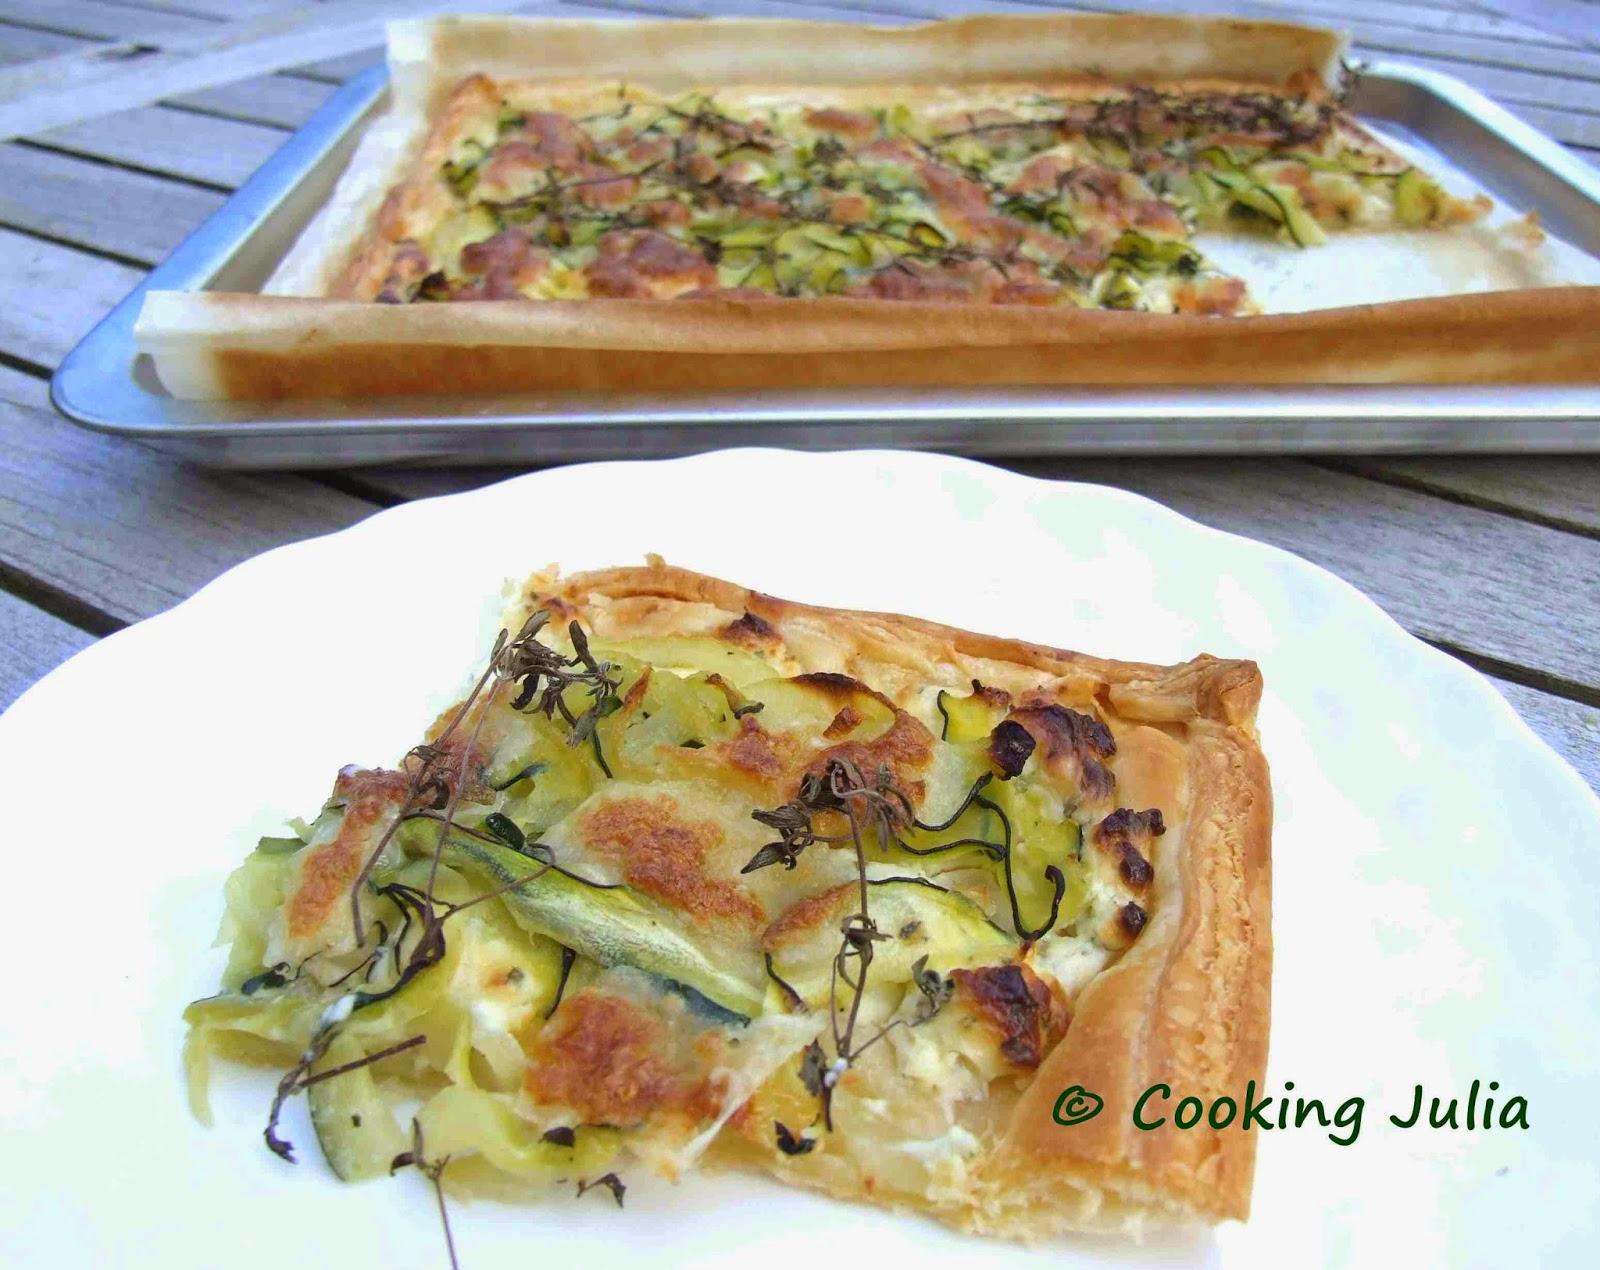 Cooking julia tarte fine au boursin et la courgette - Courgette boursin cuisine ...